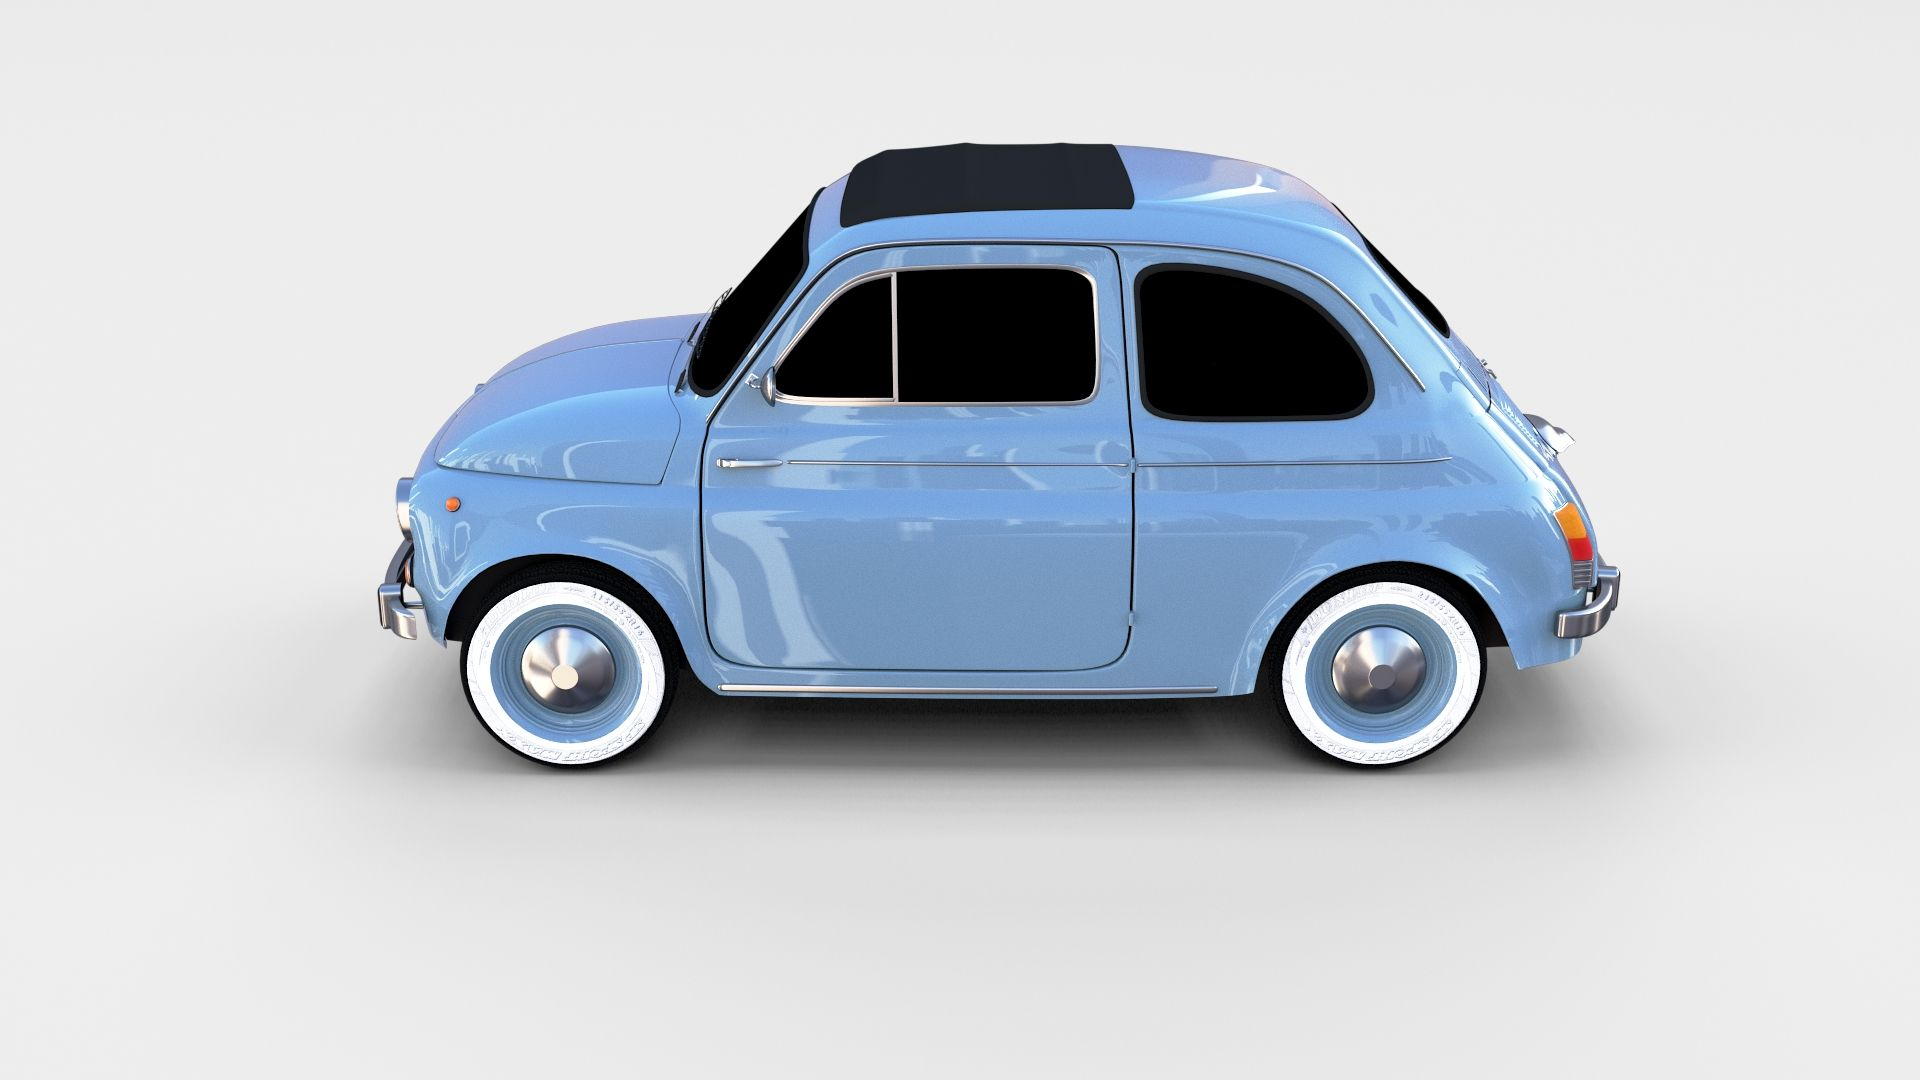 Fiat 500 Nuova 1957 Rev Fiat Nuova Rev Fiat 500 Fiat Fiat